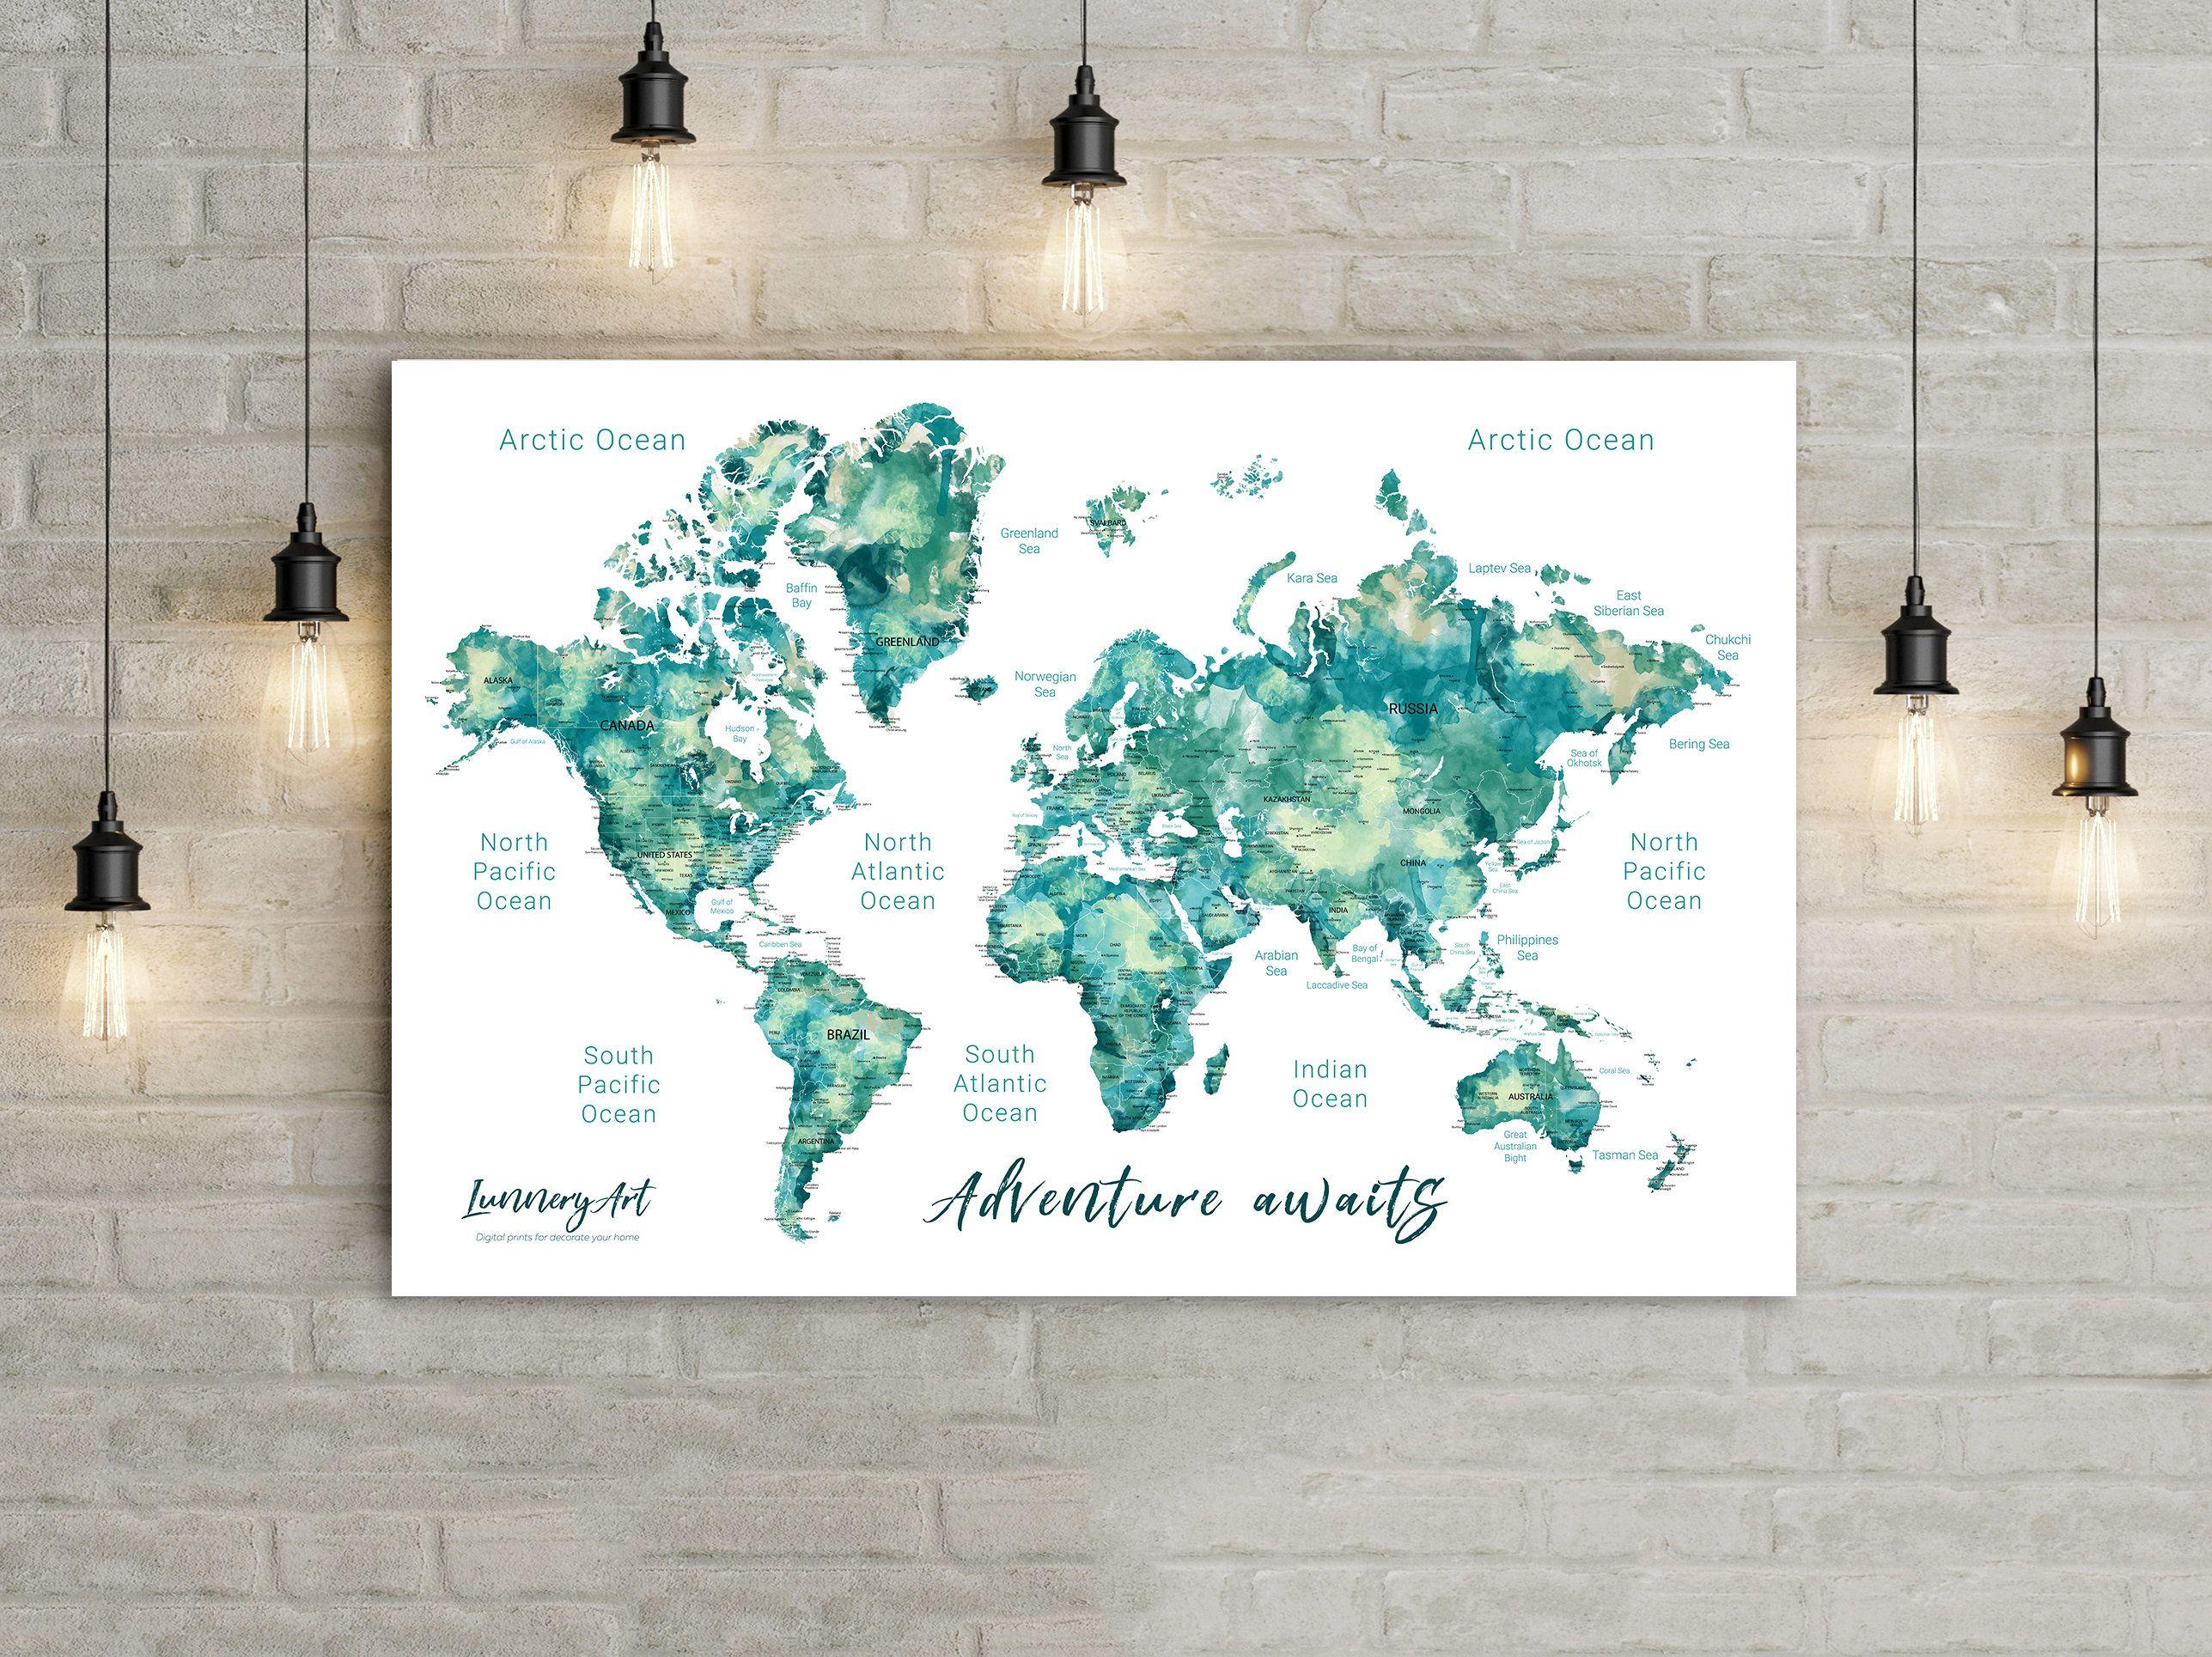 Custom map world map printable file for printing a push pin map custom map world map printable file for printing a push pin map watercolor map poster wall decor art print digital files gumiabroncs Image collections